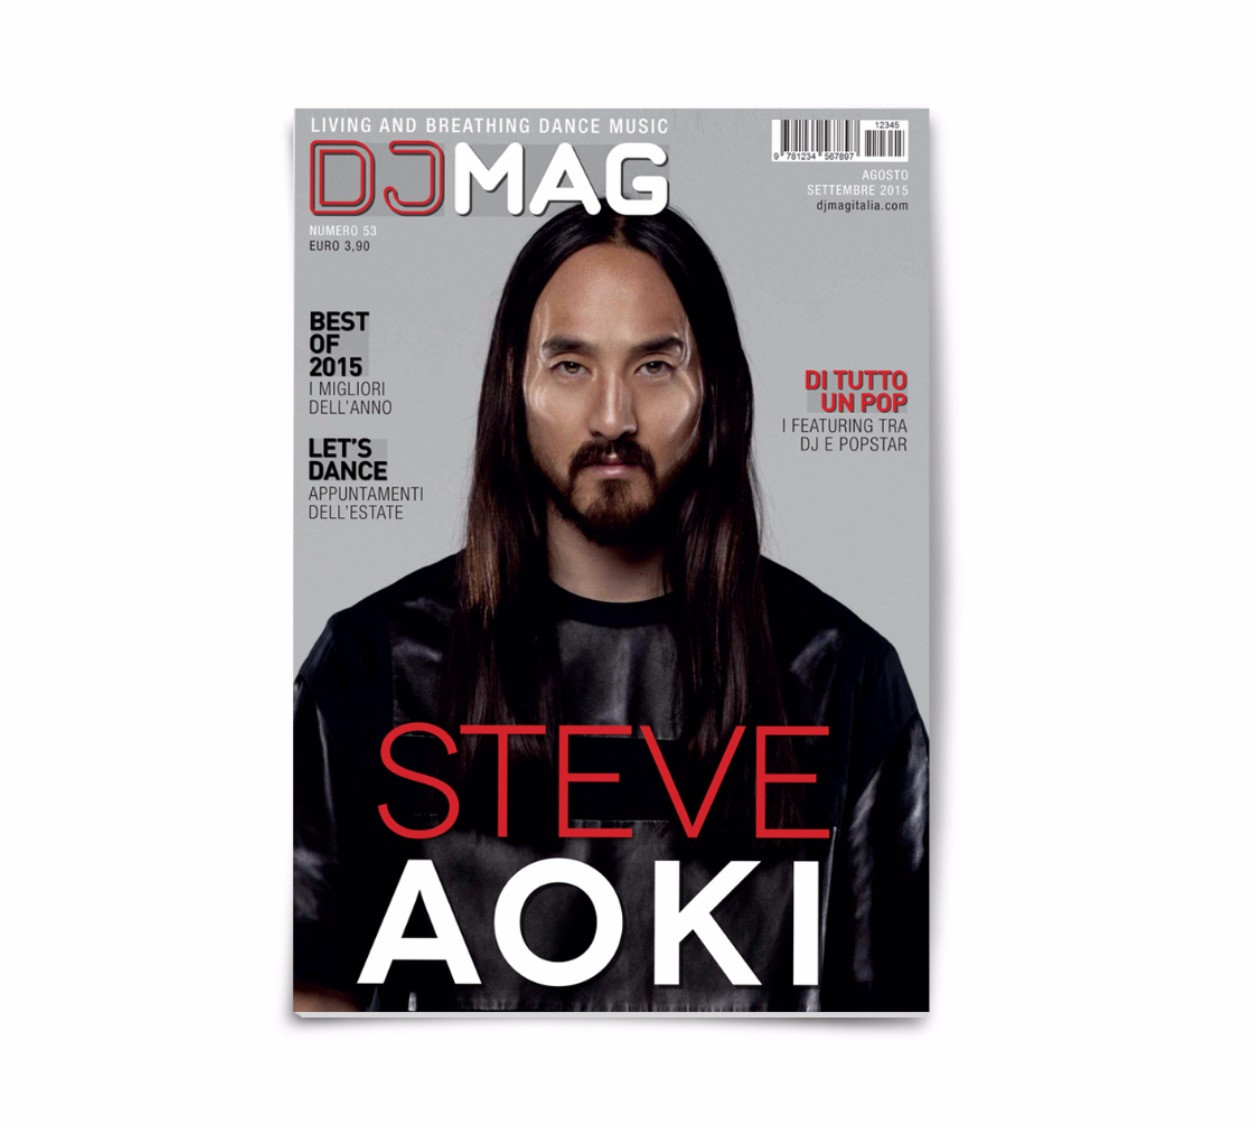 DJ MAG Redesign